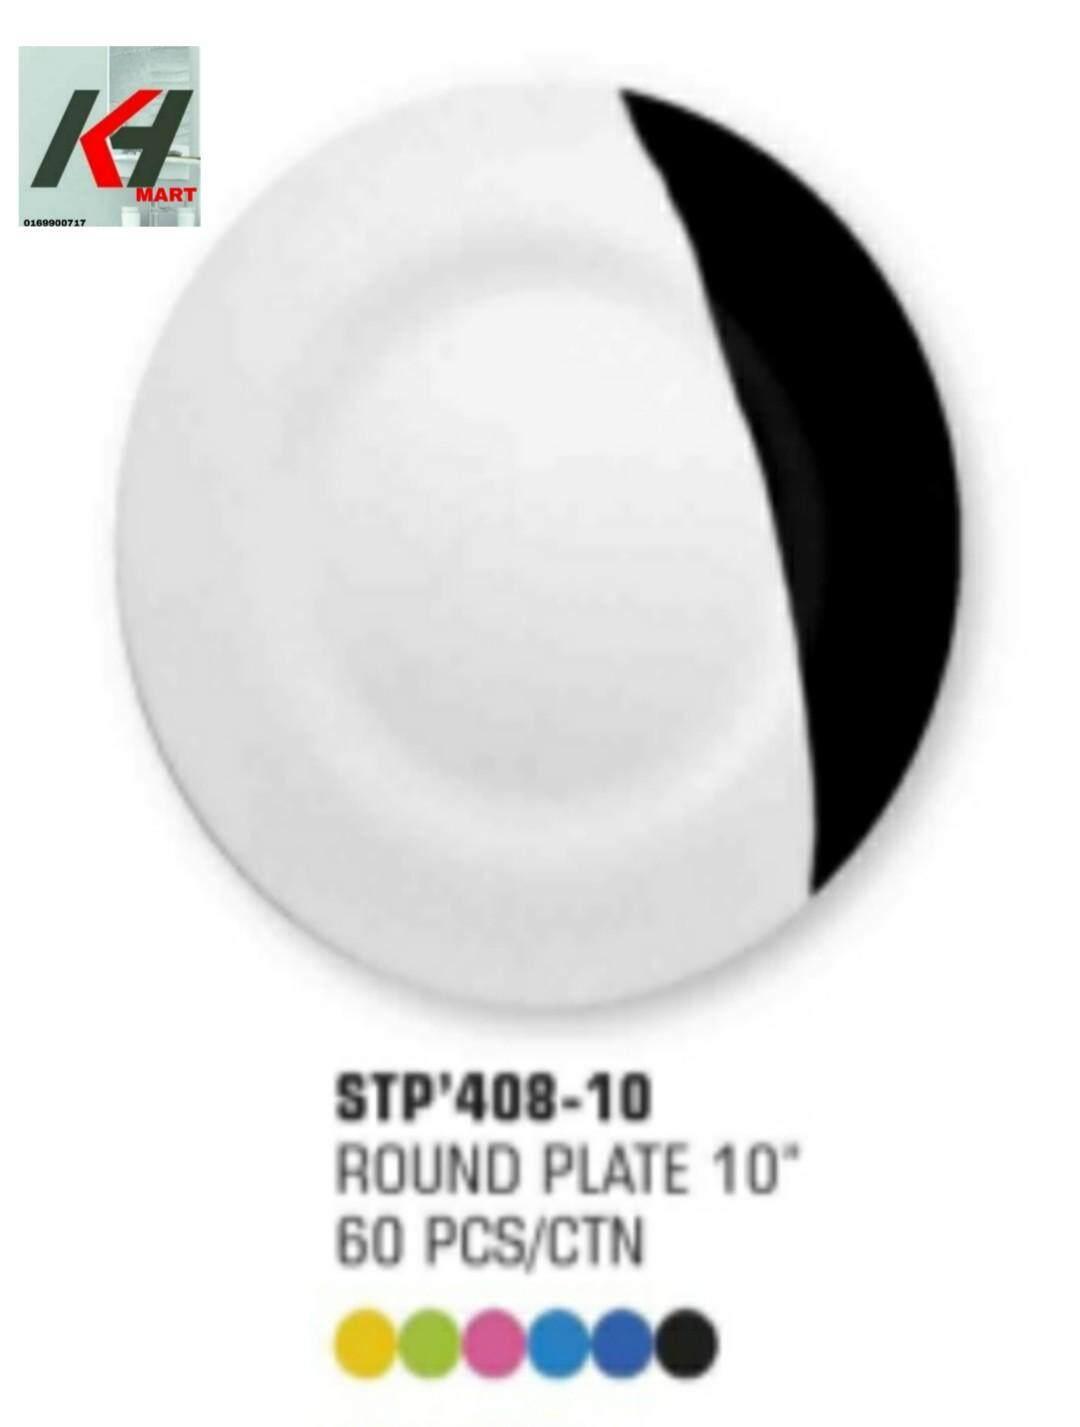 MELAMINE / MILAMINE TWO TONE ROUND PLATE 10   1 PCS READY STOCK